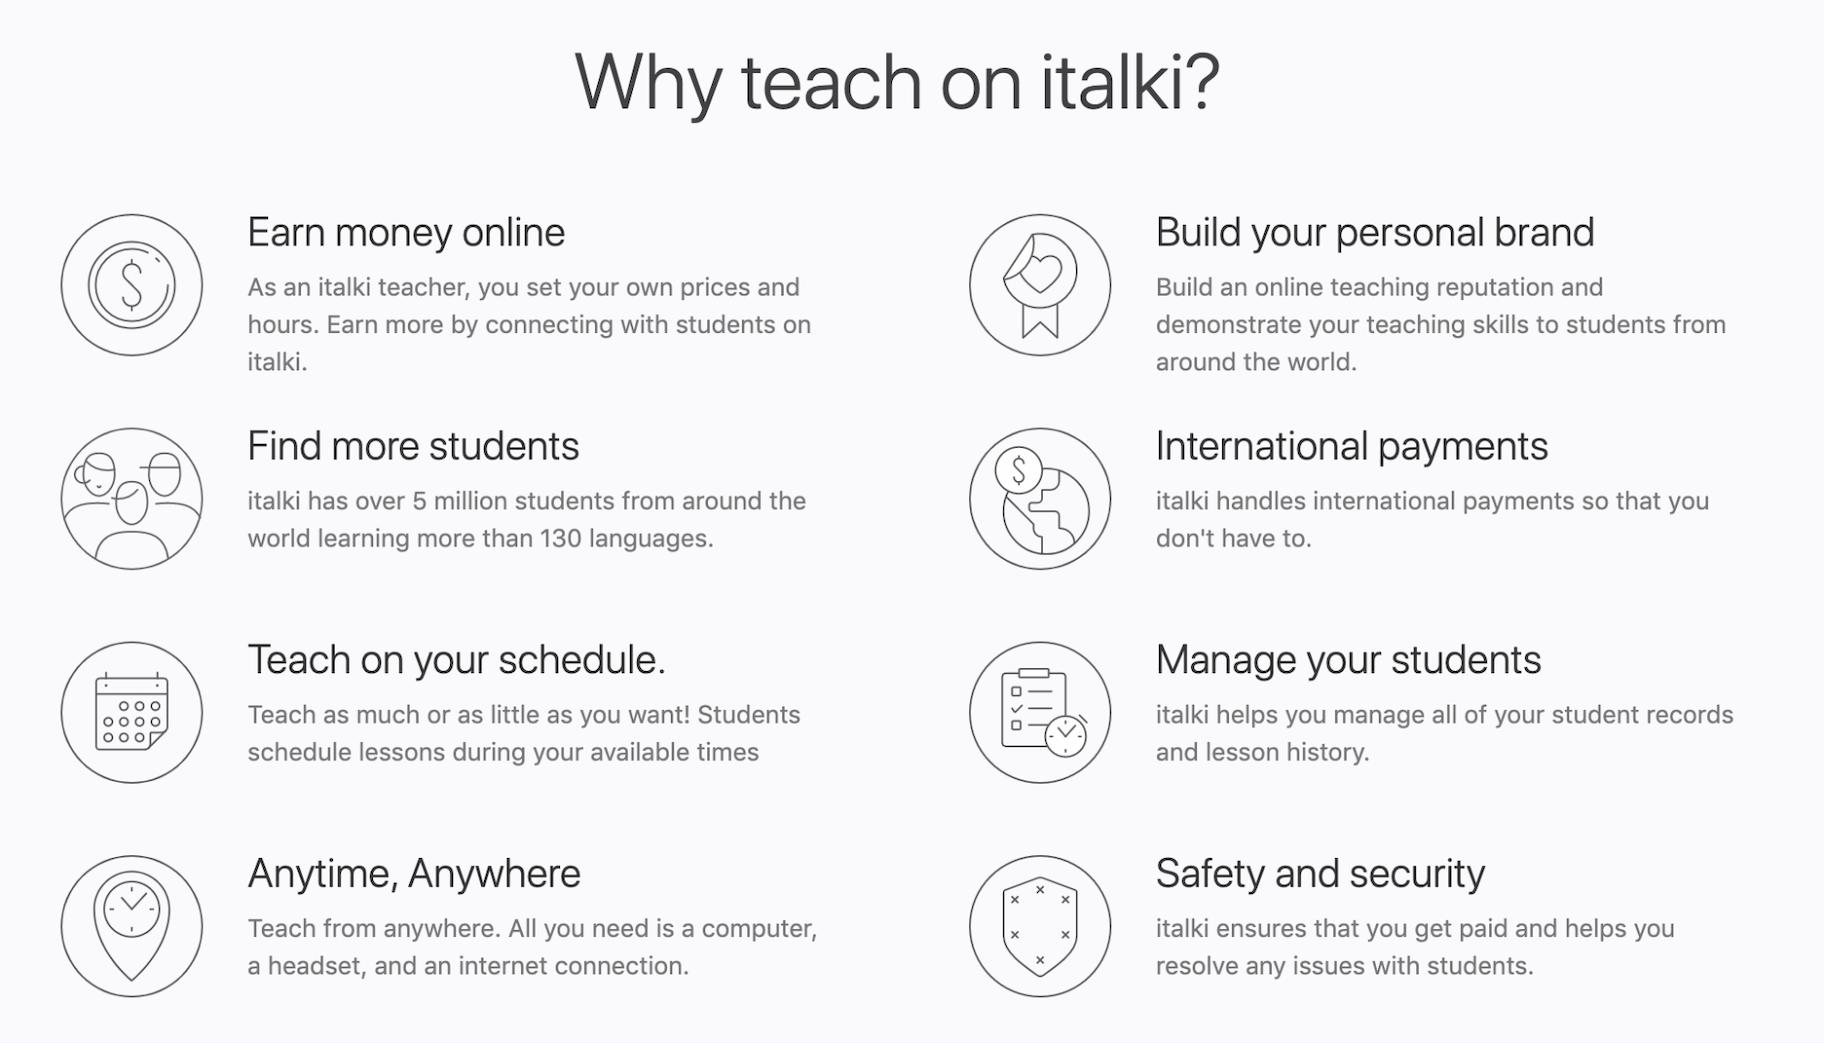 iTalki Online Teaching Platform